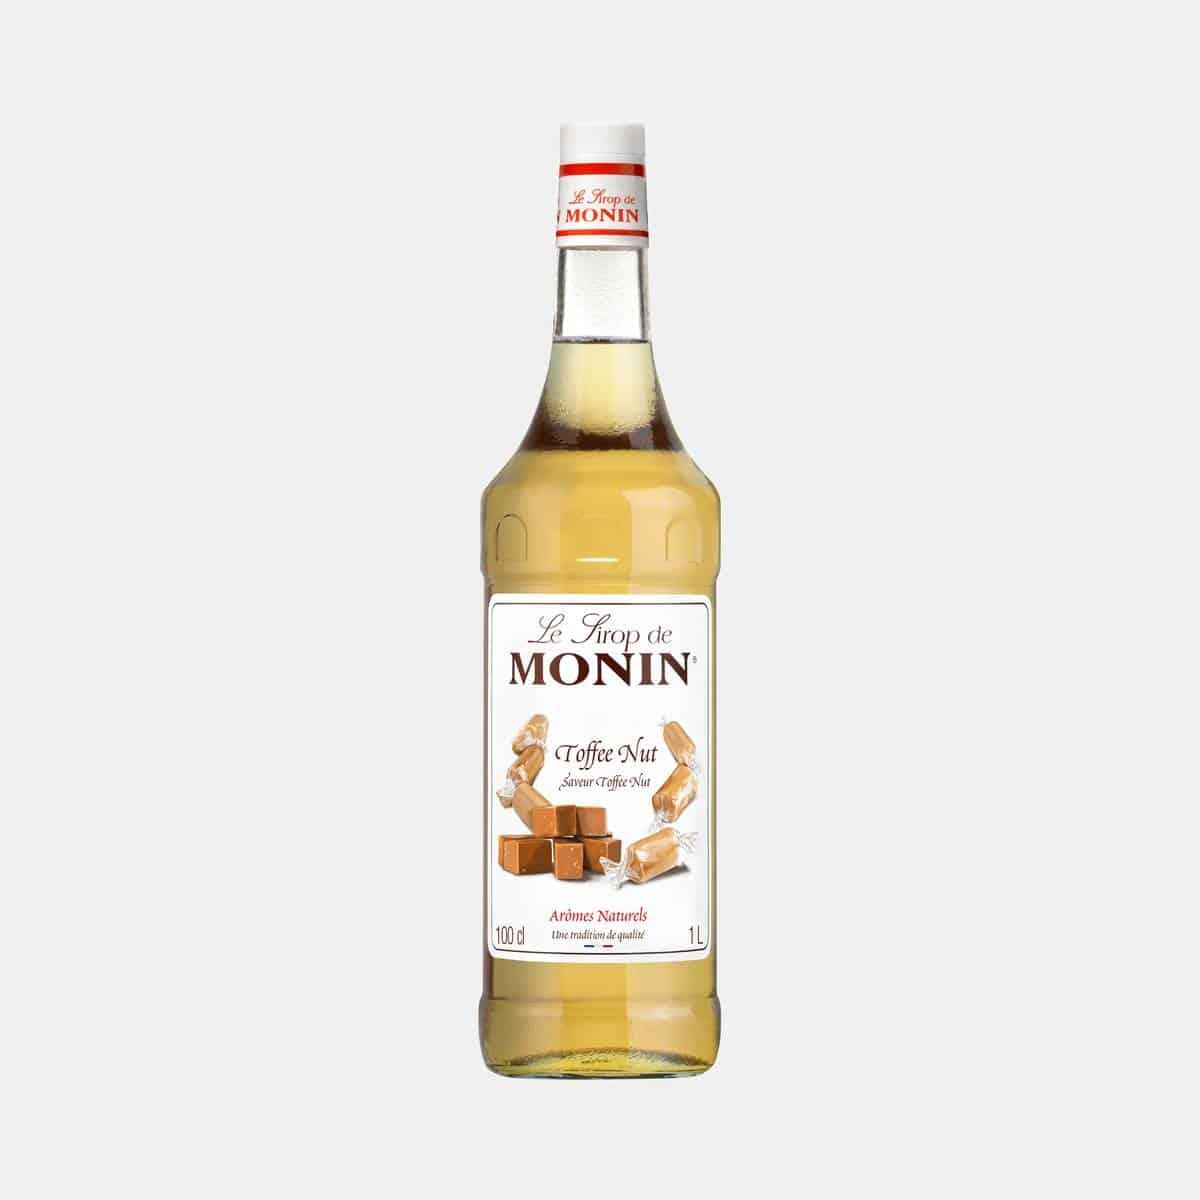 Monin Toffee Nut Syrup 1 Liter Glass Bottle